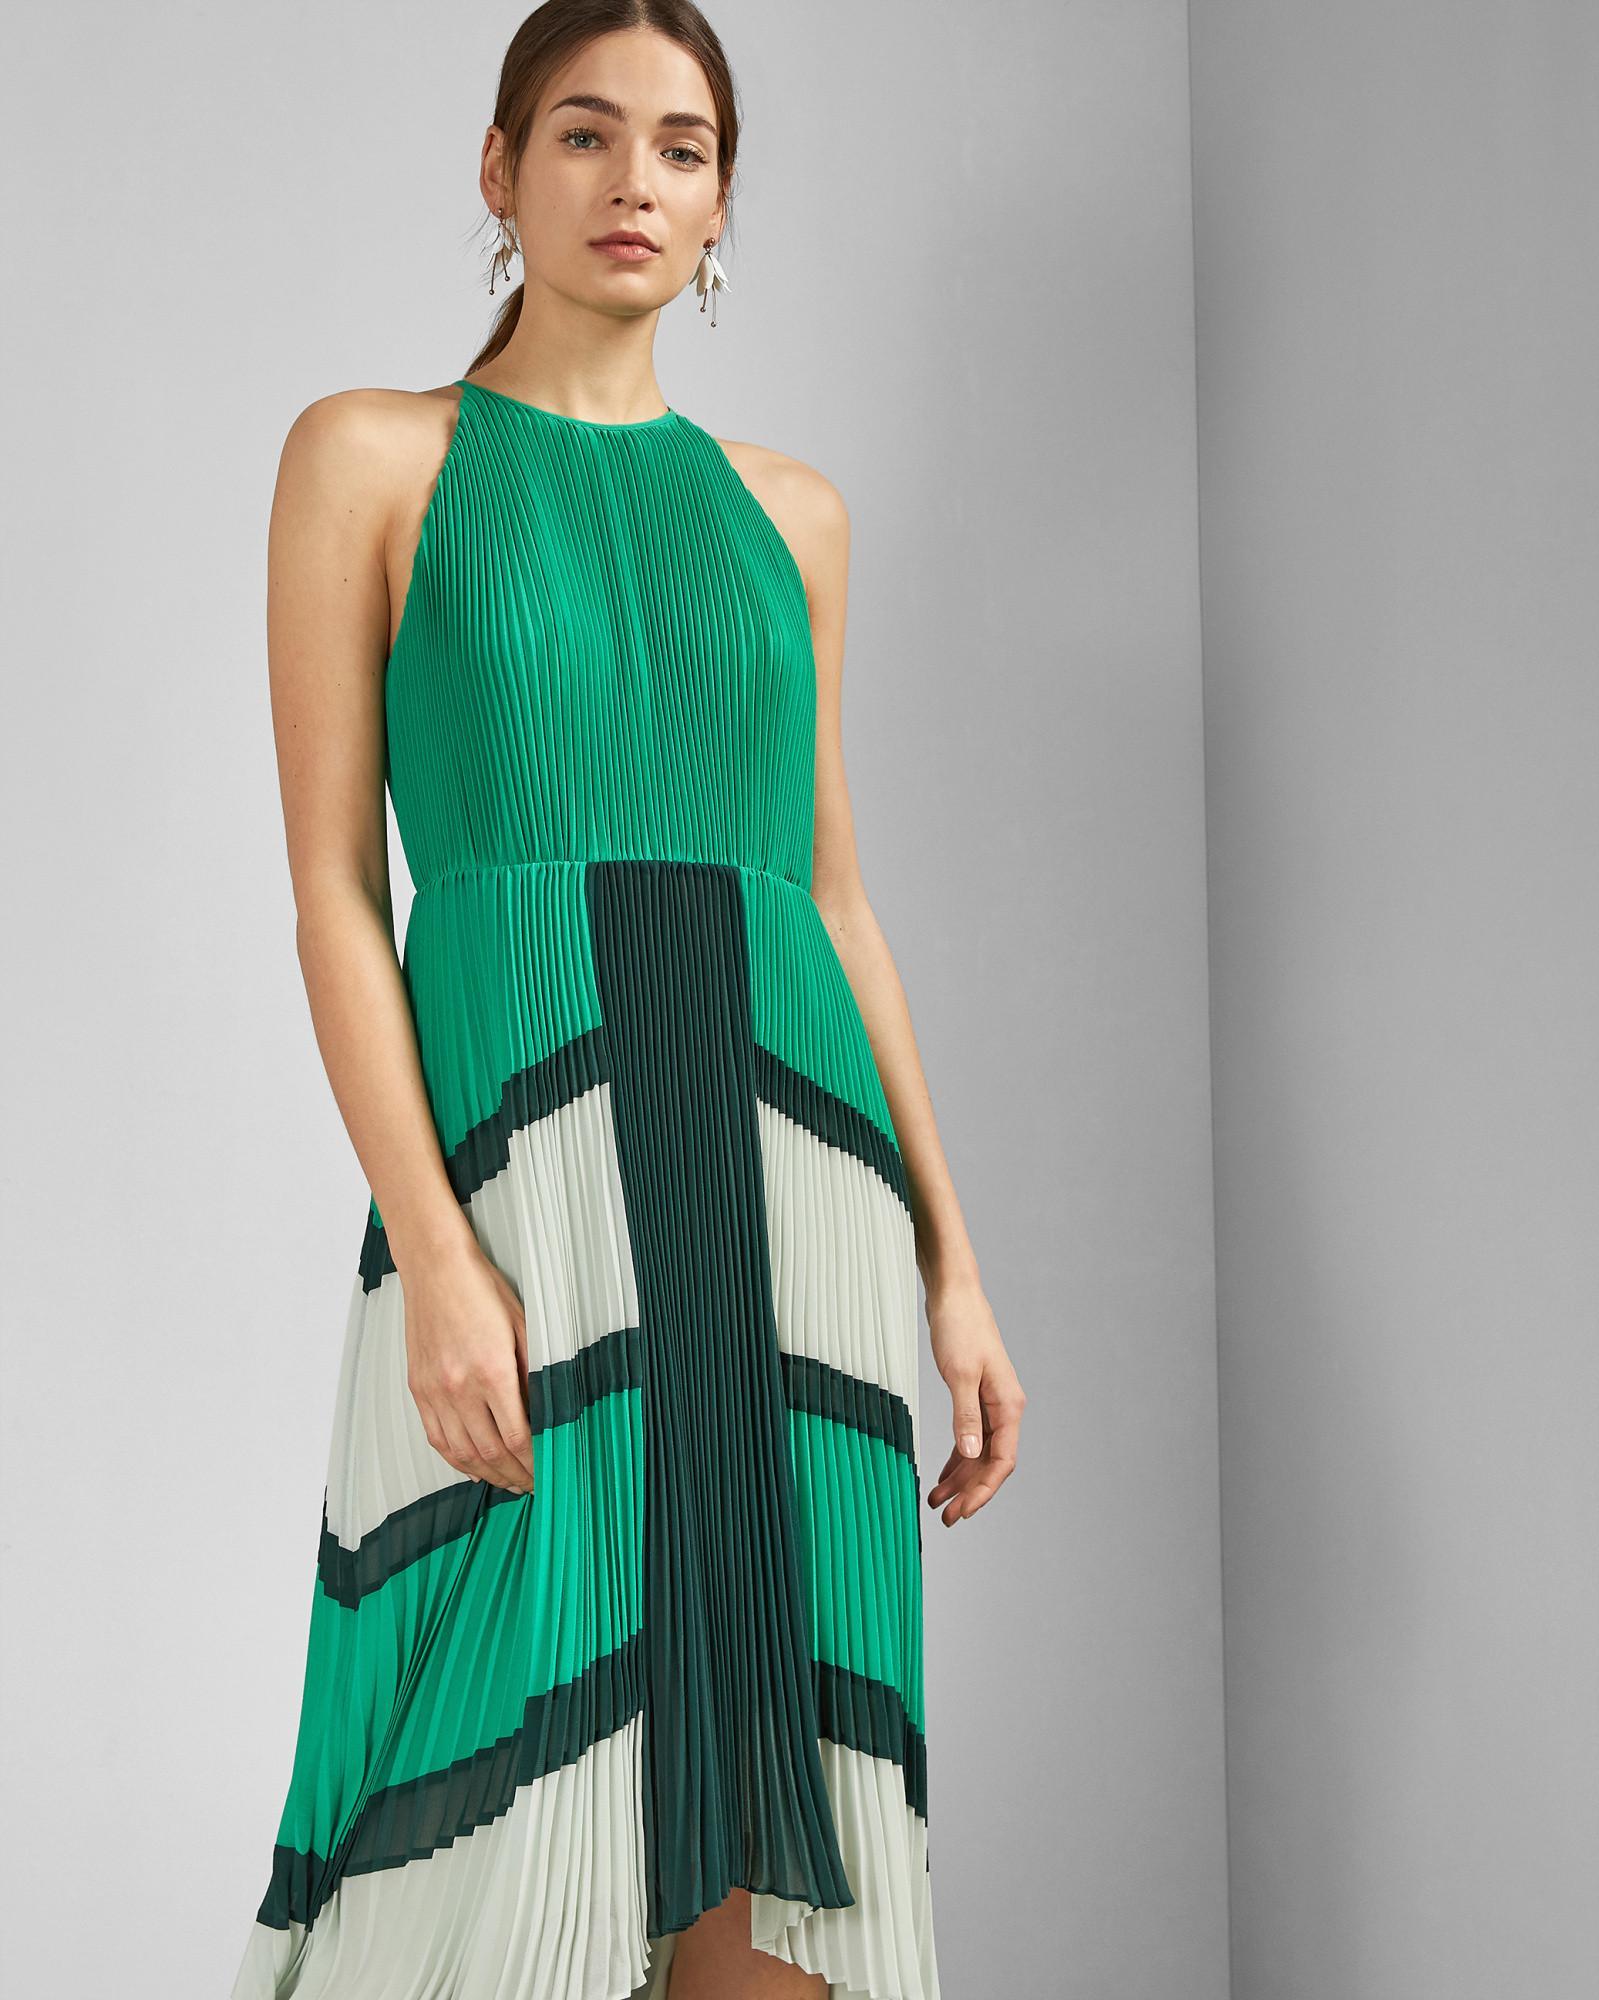 9b74688cc51ea Ted Baker Dip Hem Pleated Dress in Green - Lyst